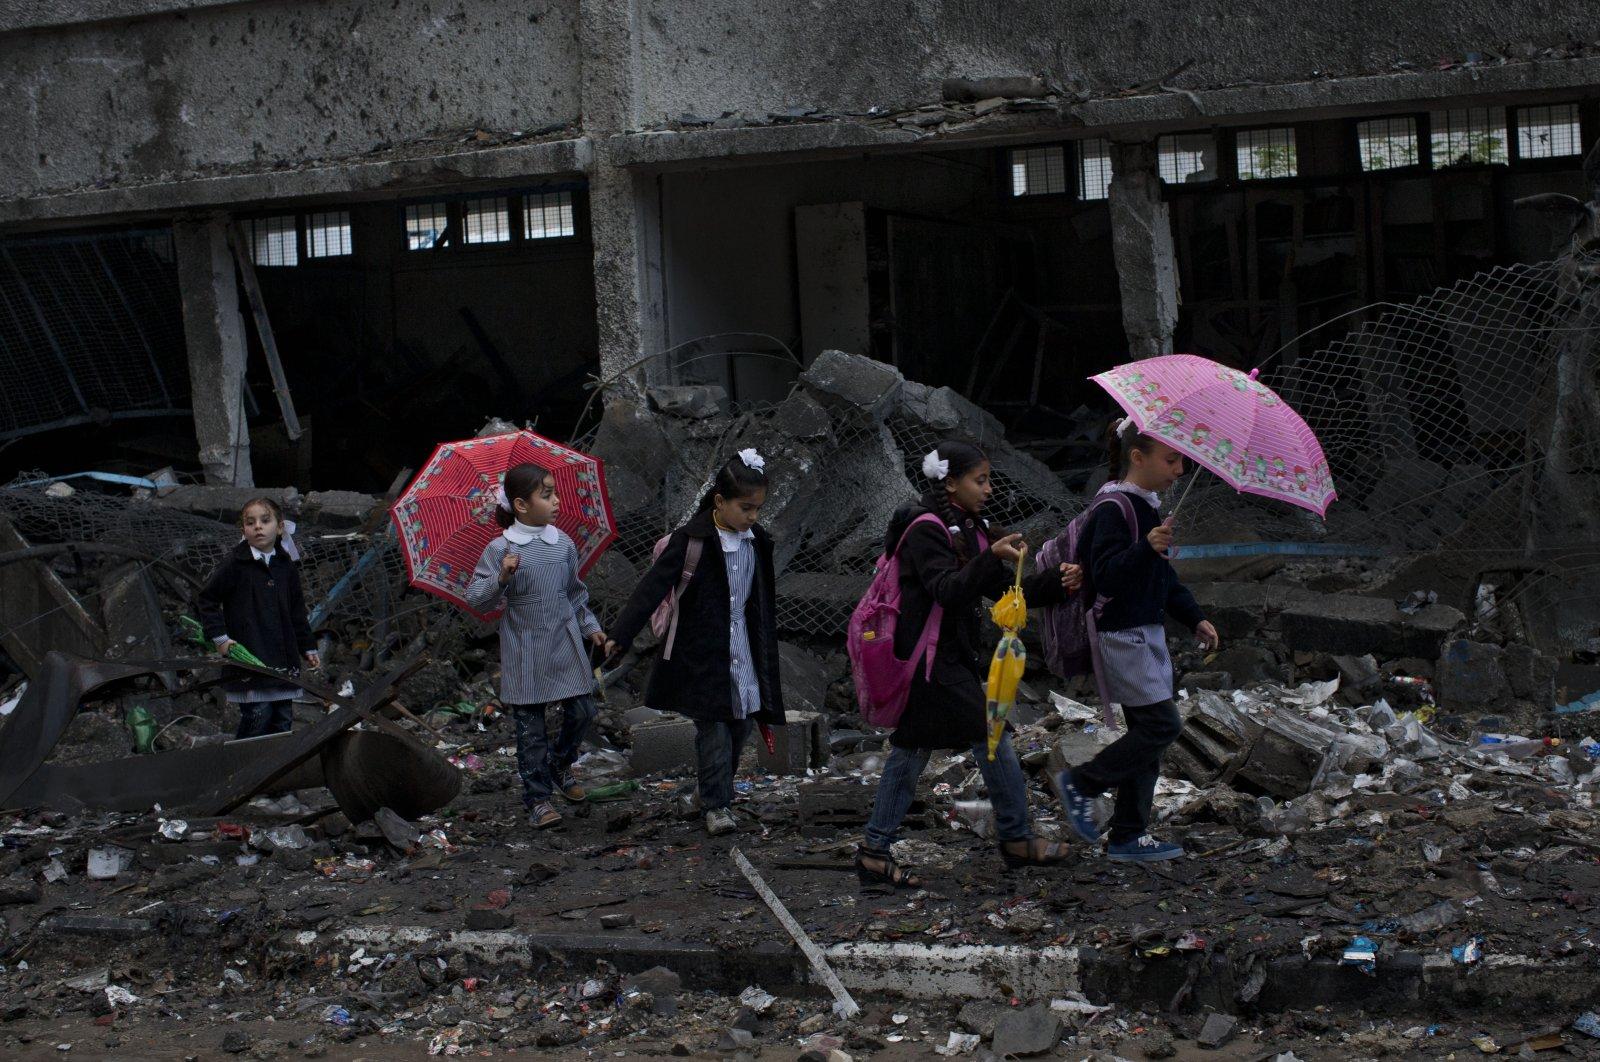 Palestinian schoolchildren walk among the debris of a damaged school targeted by Israeli attacks in Gaza City, Palestine, Nov. 24, 2012. (AP Photo)